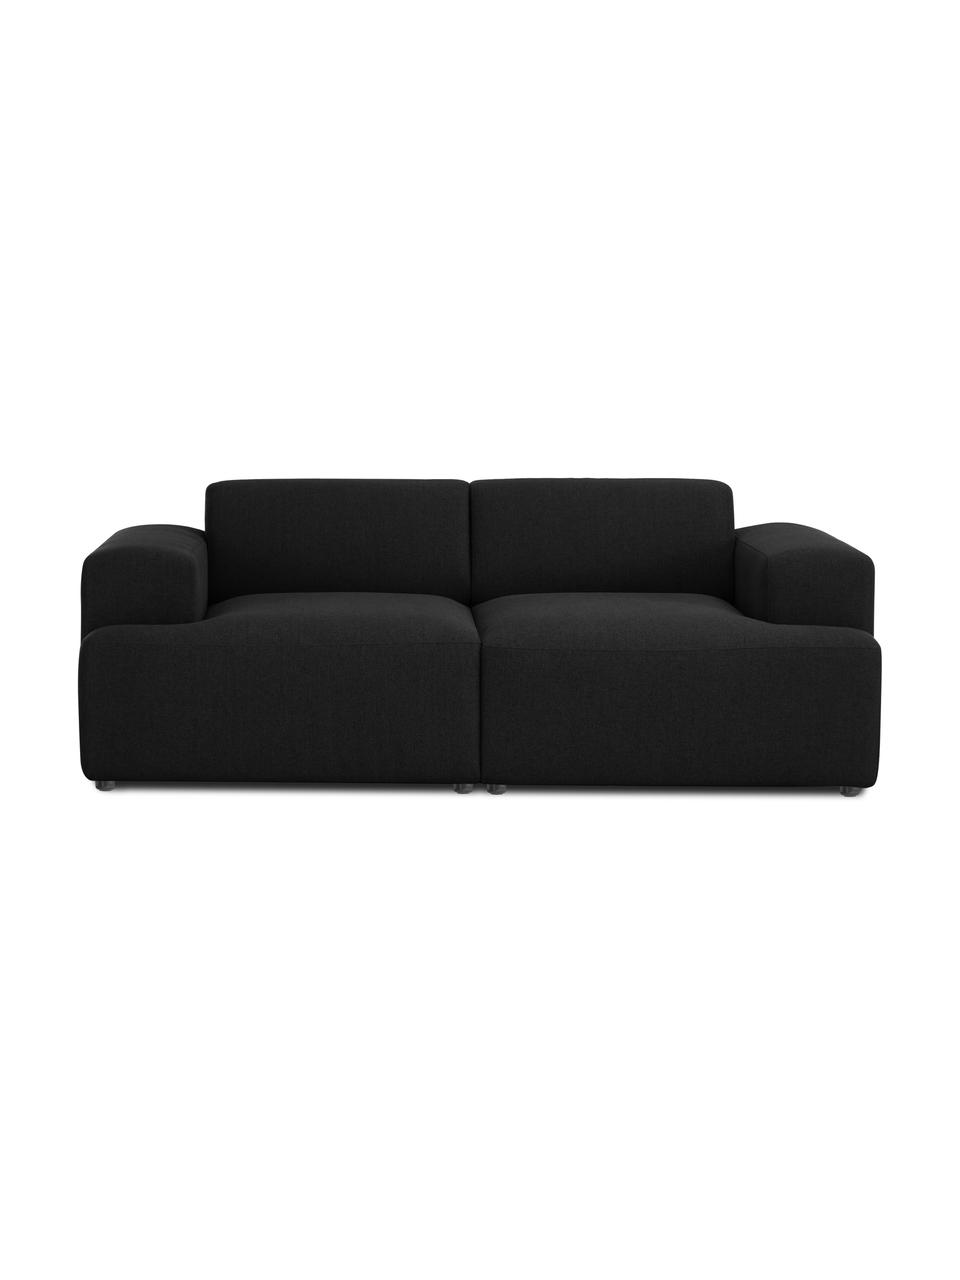 Sofa Melva (2-Sitzer) in Schwarz, Bezug: 100% Polyester Der hochwe, Gestell: Massives Kiefernholz, FSC, Füße: Kunststoff, Webstoff Schwarz, B 198 x T 101 cm